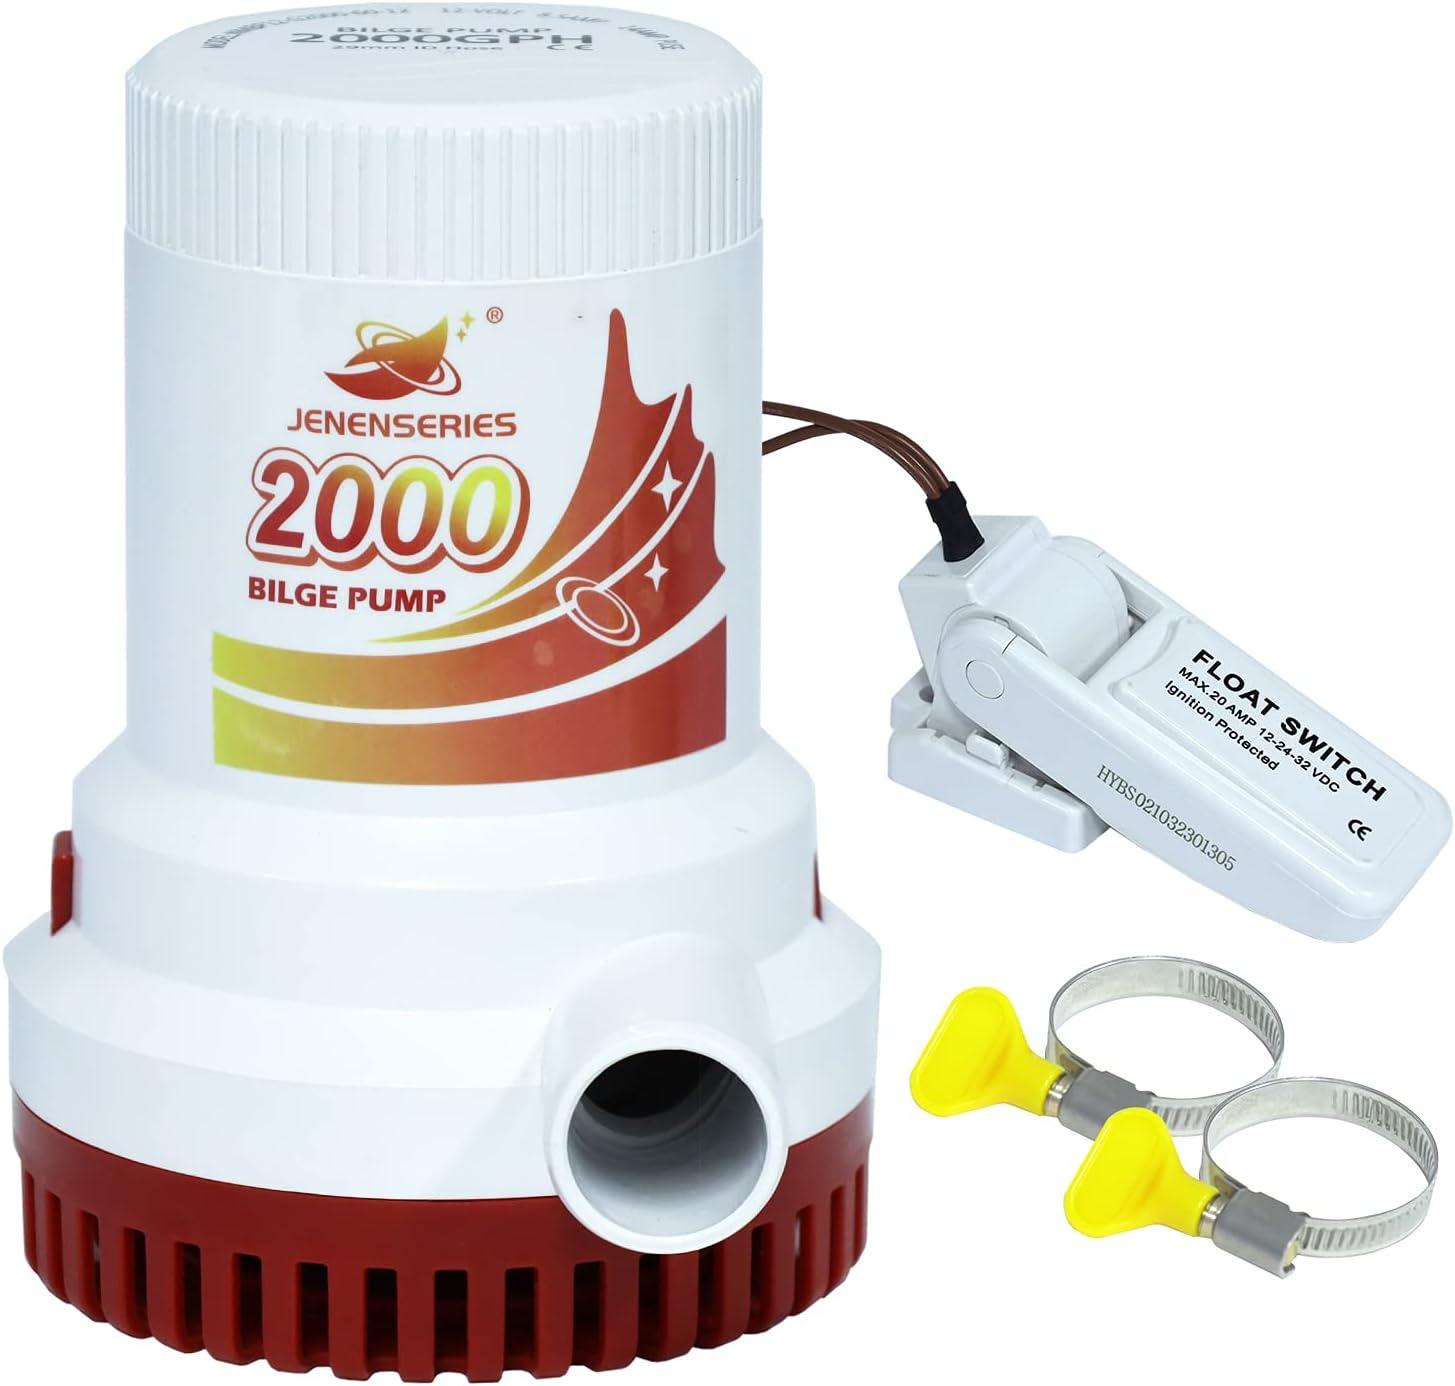 JENENSERIES Bilge Special sale item Pumps 2000 Elegant GPH for Electric mari Non-Automatic